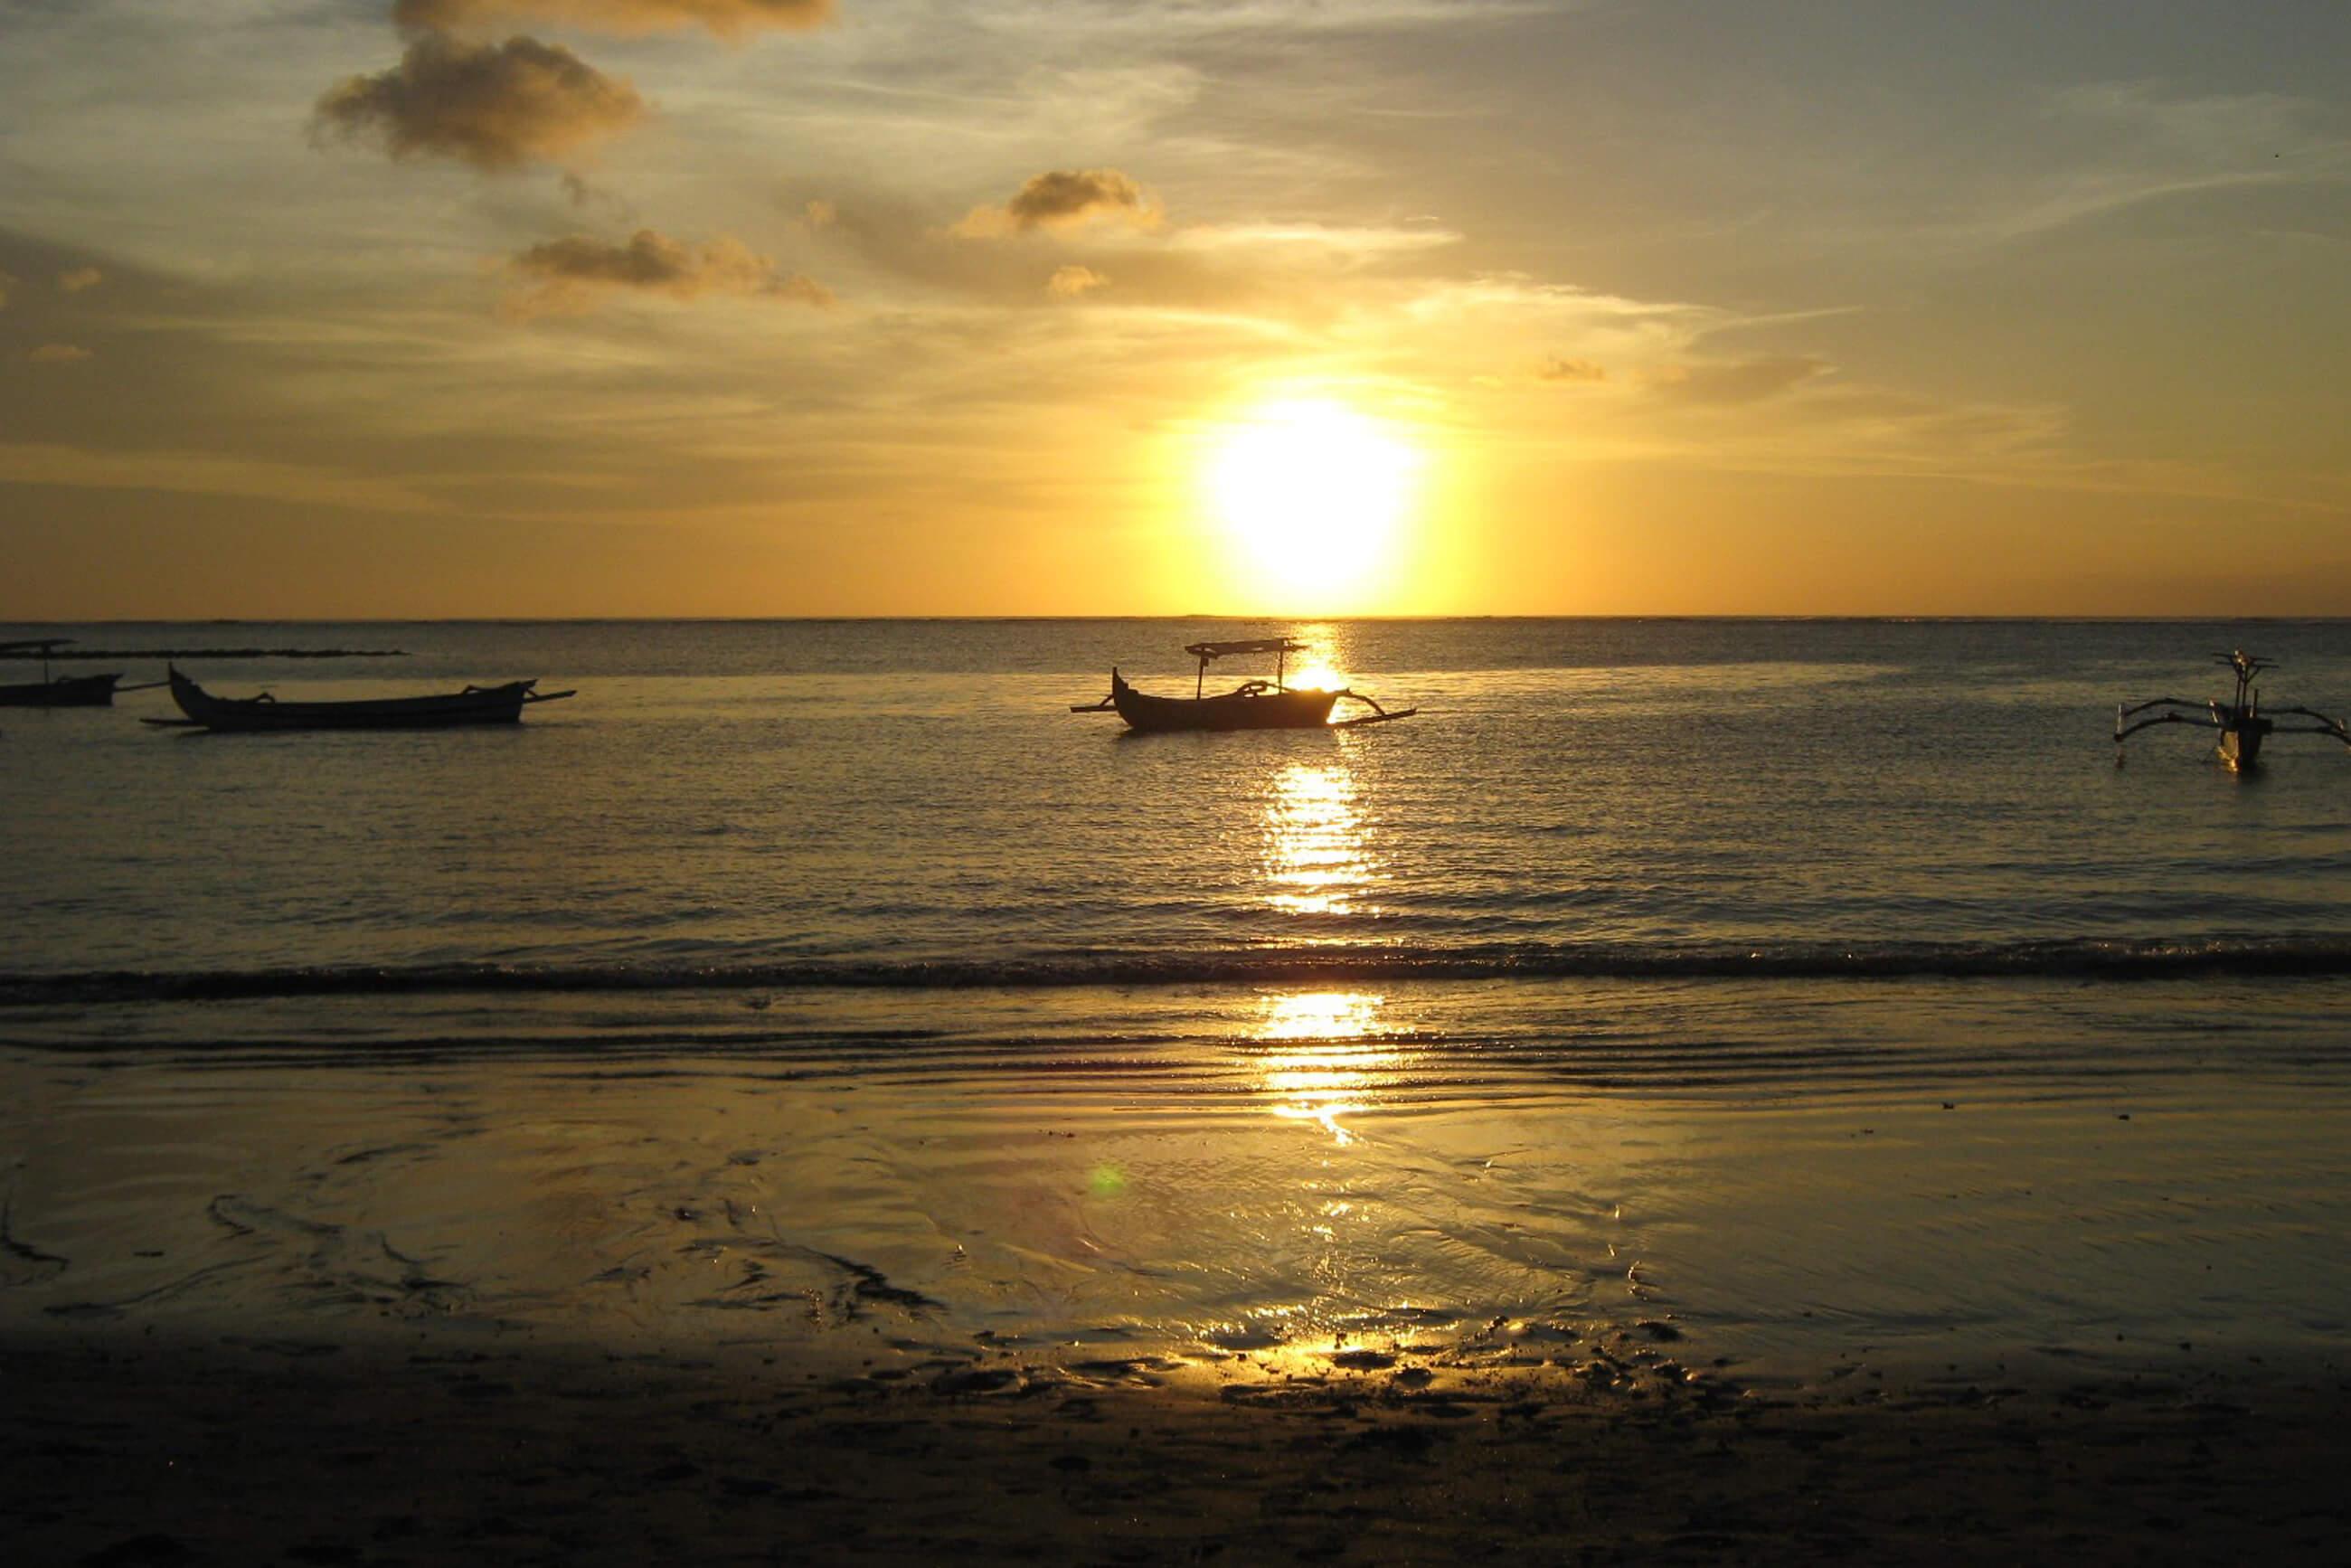 https://bubo.sk/uploads/galleries/7466/pixabay_indonezia_beach-61130-1-.jpg